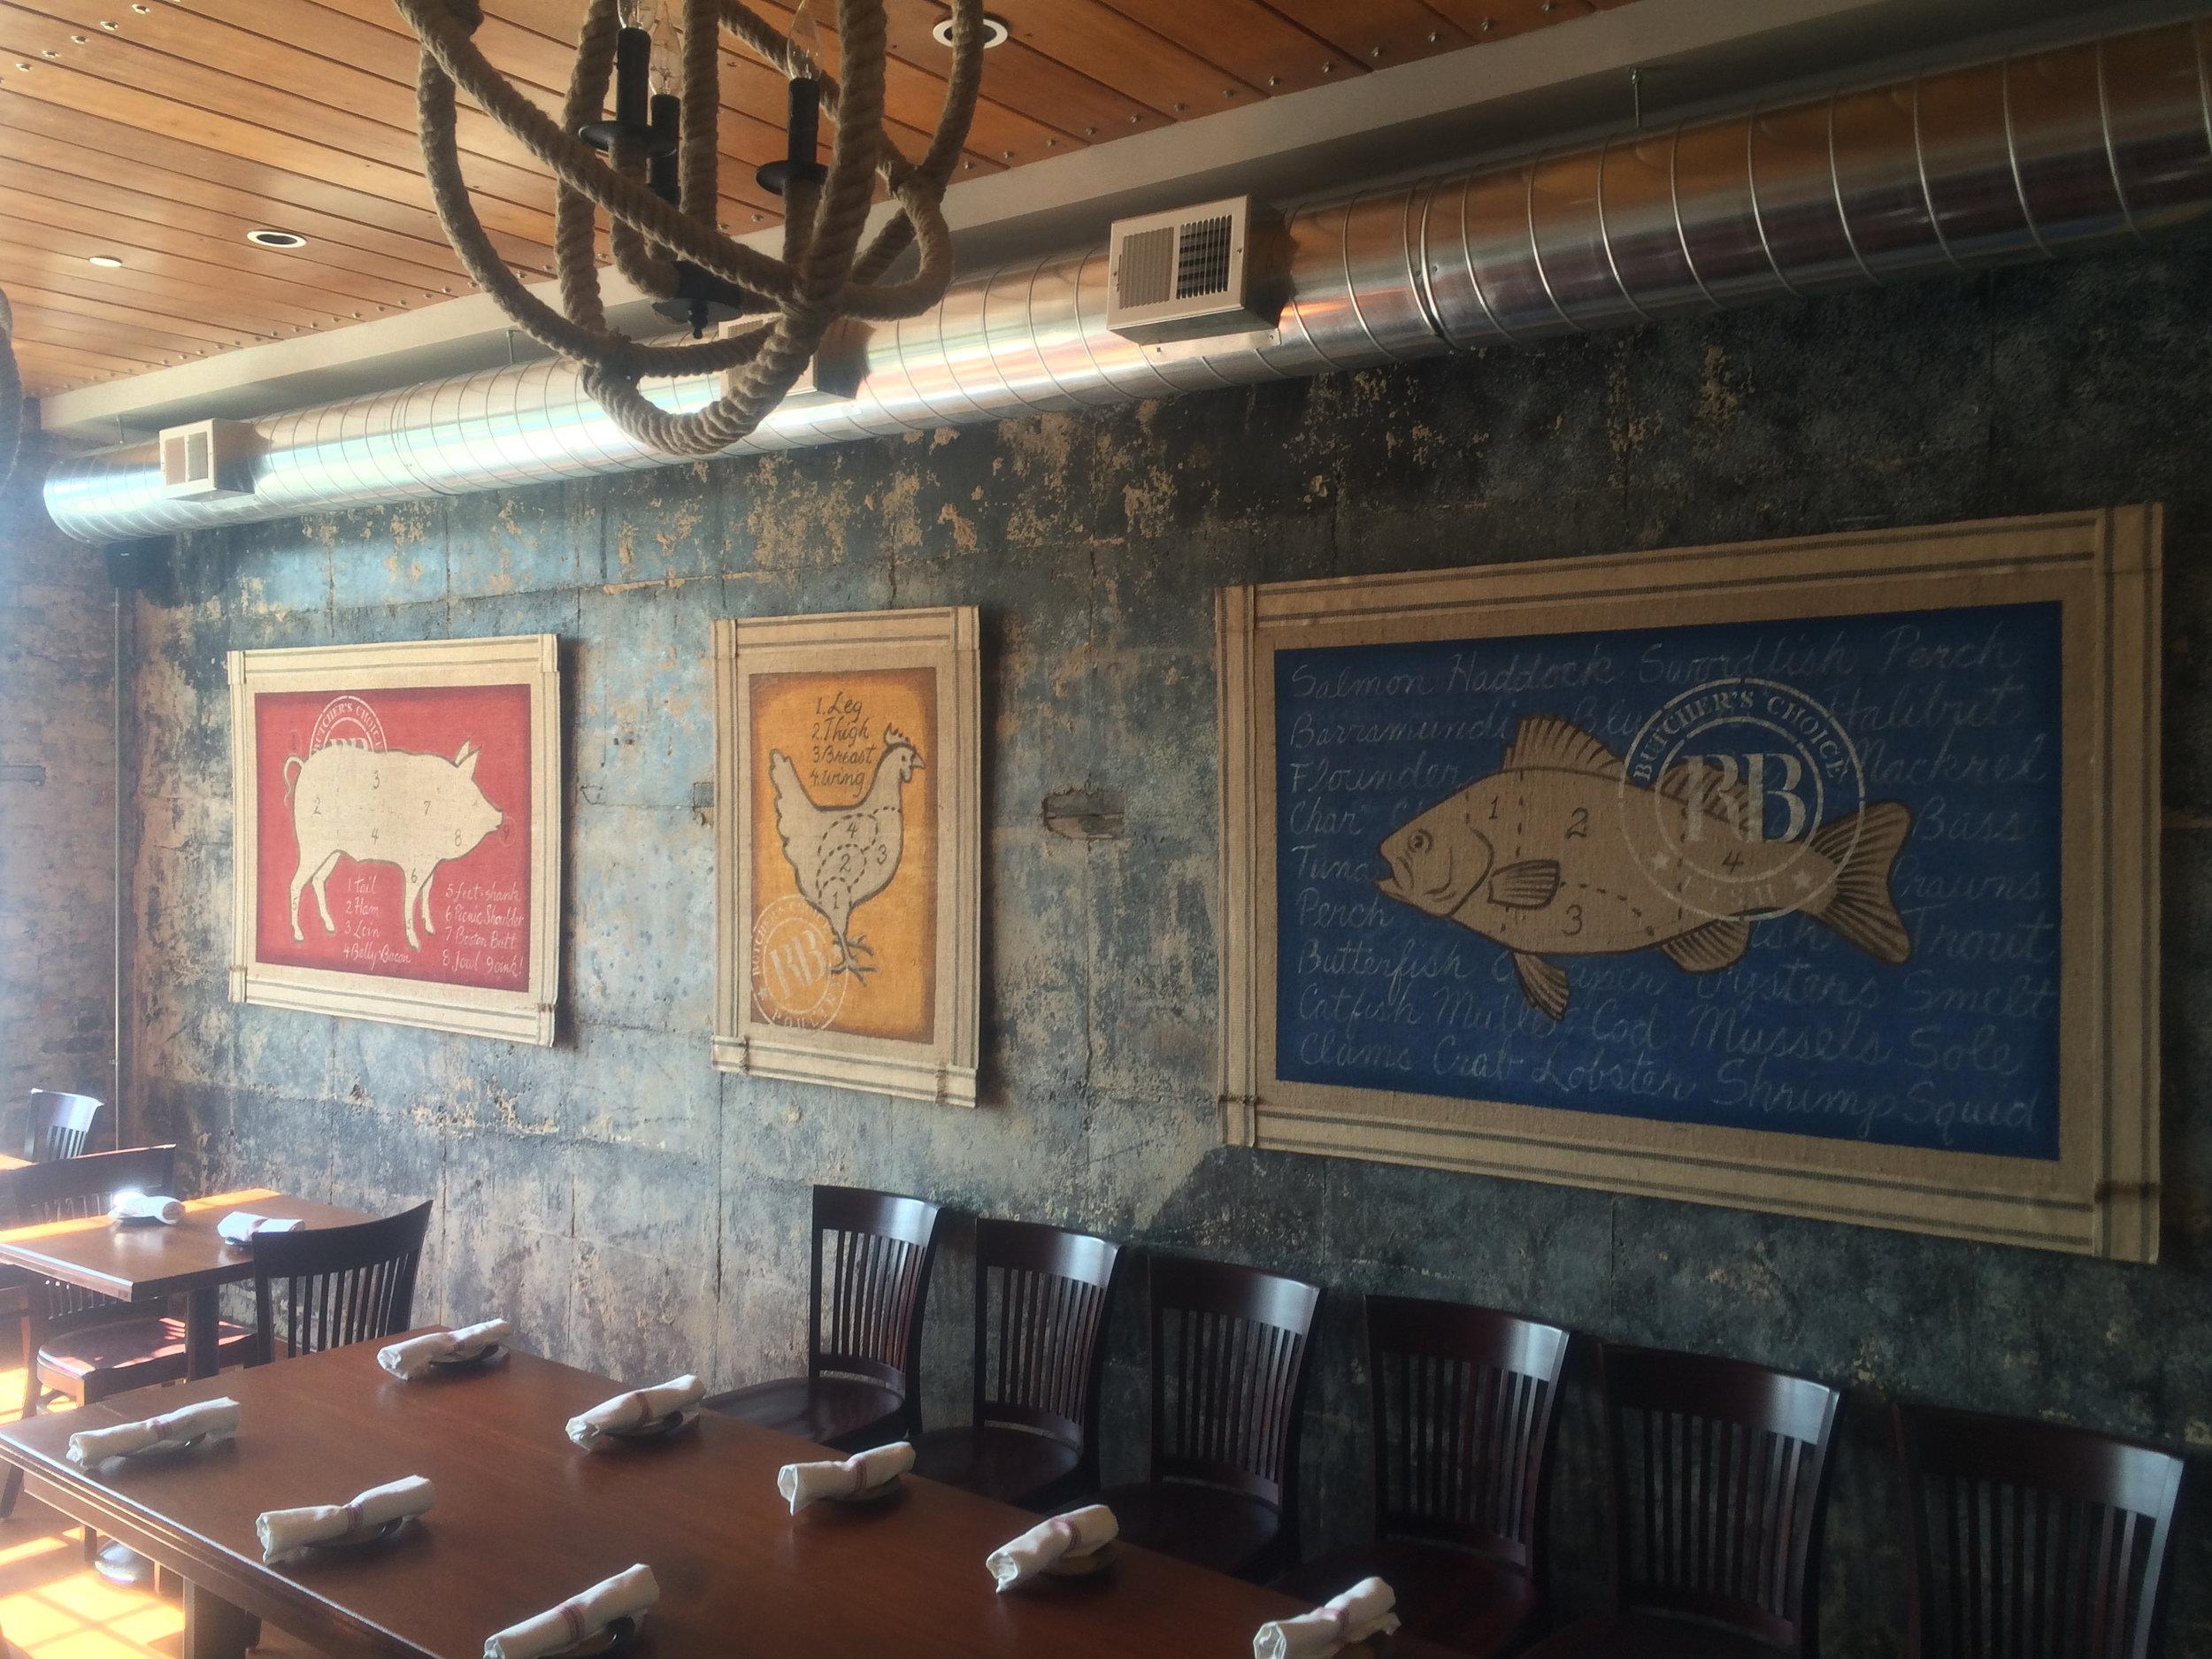 Dining room paintings at Roberts Block Restaurant Glenside PA